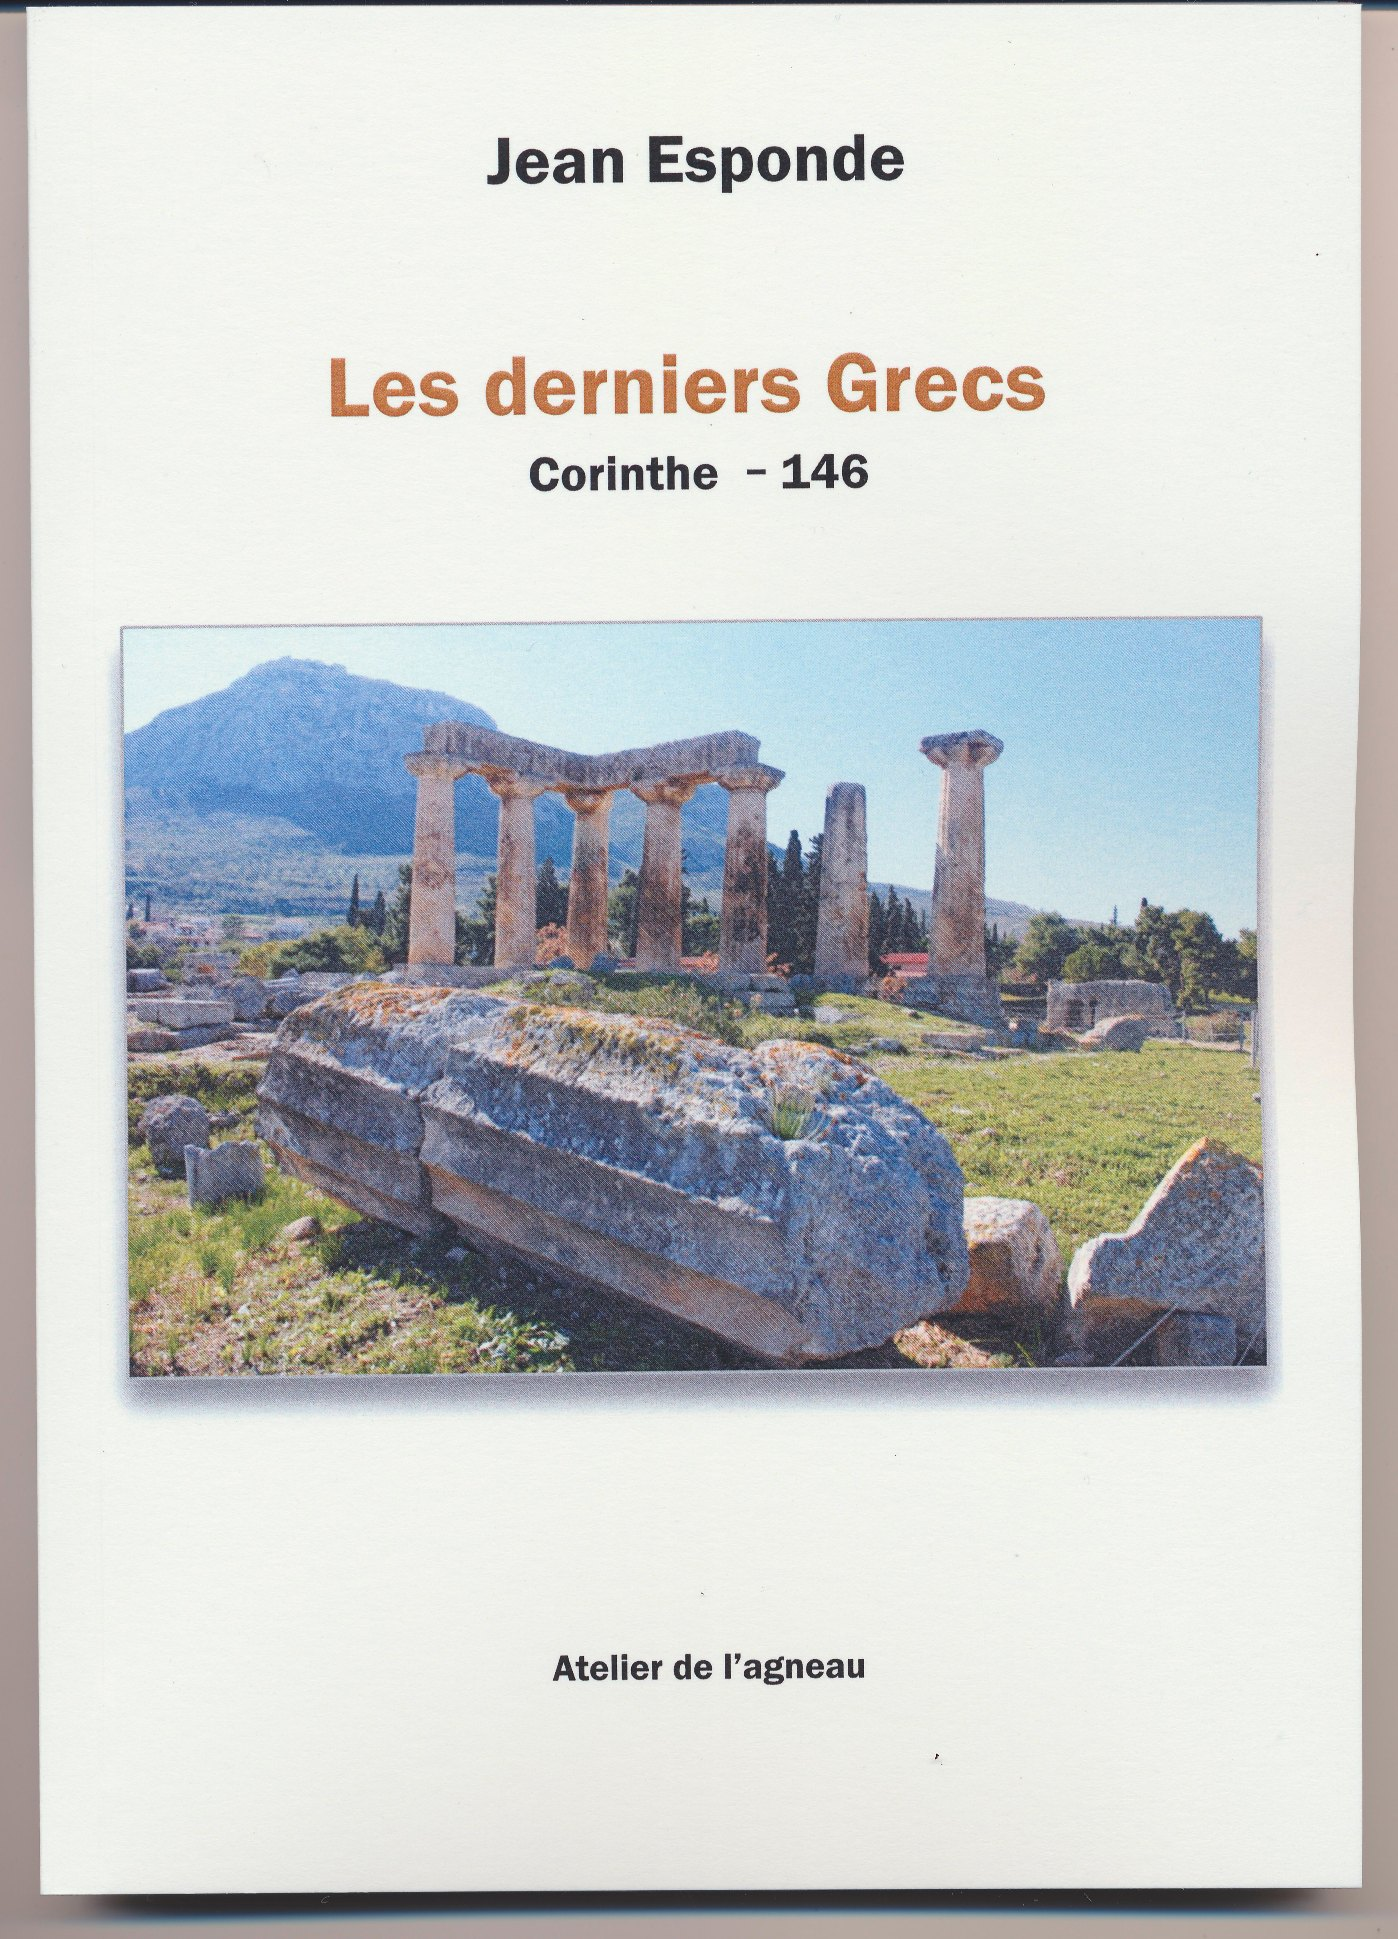 Les derniers grecs, Corinthe, 146 av.J.C